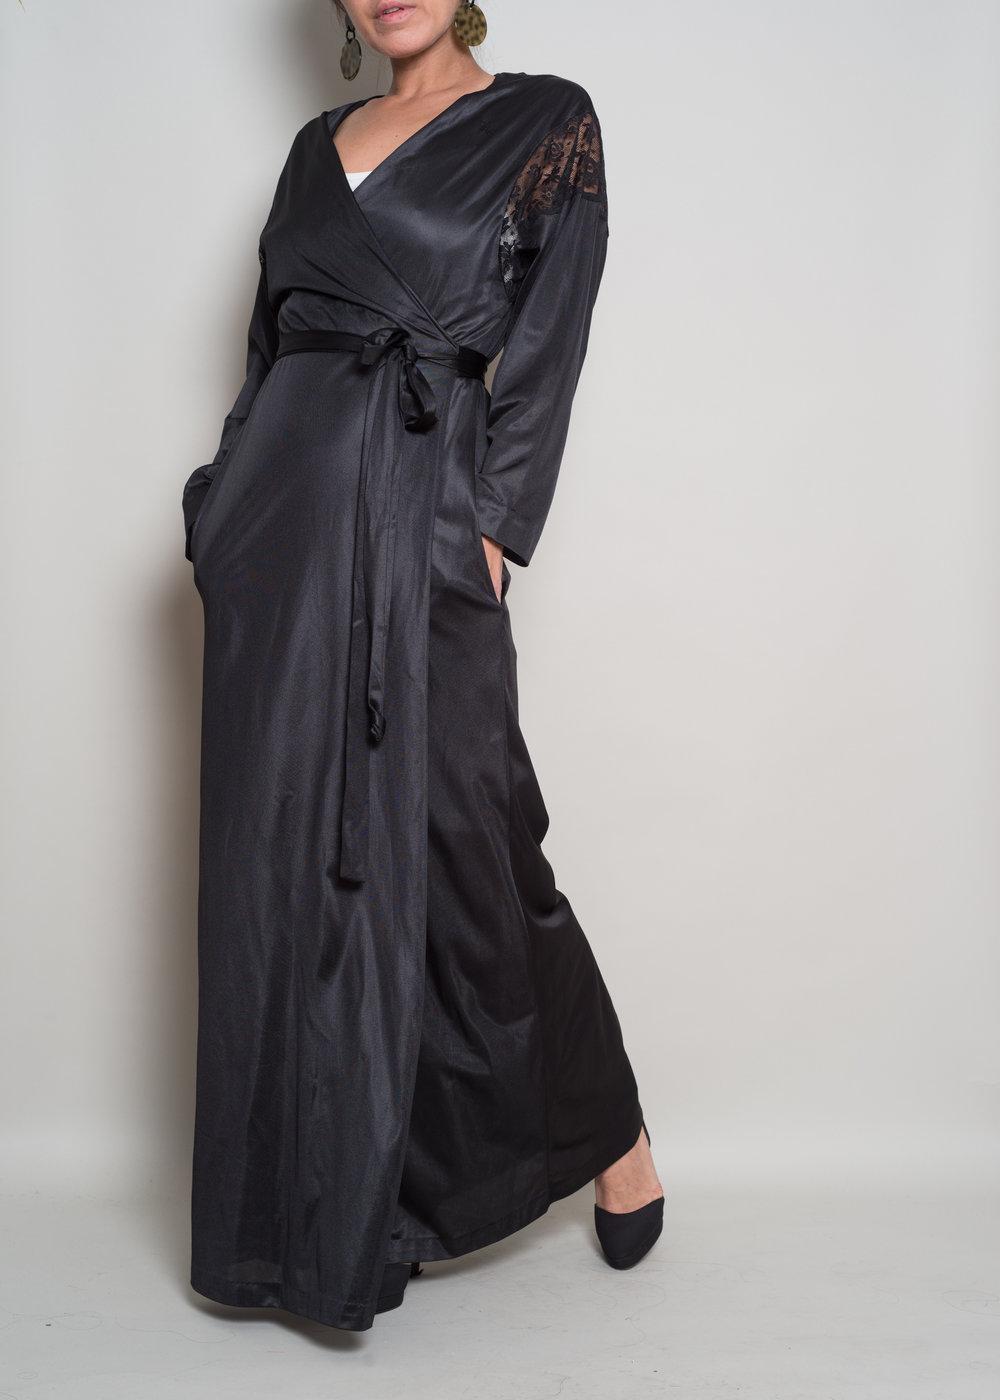 1980sDVFRobe Wrap Dress - From OMNIA VINTAGE